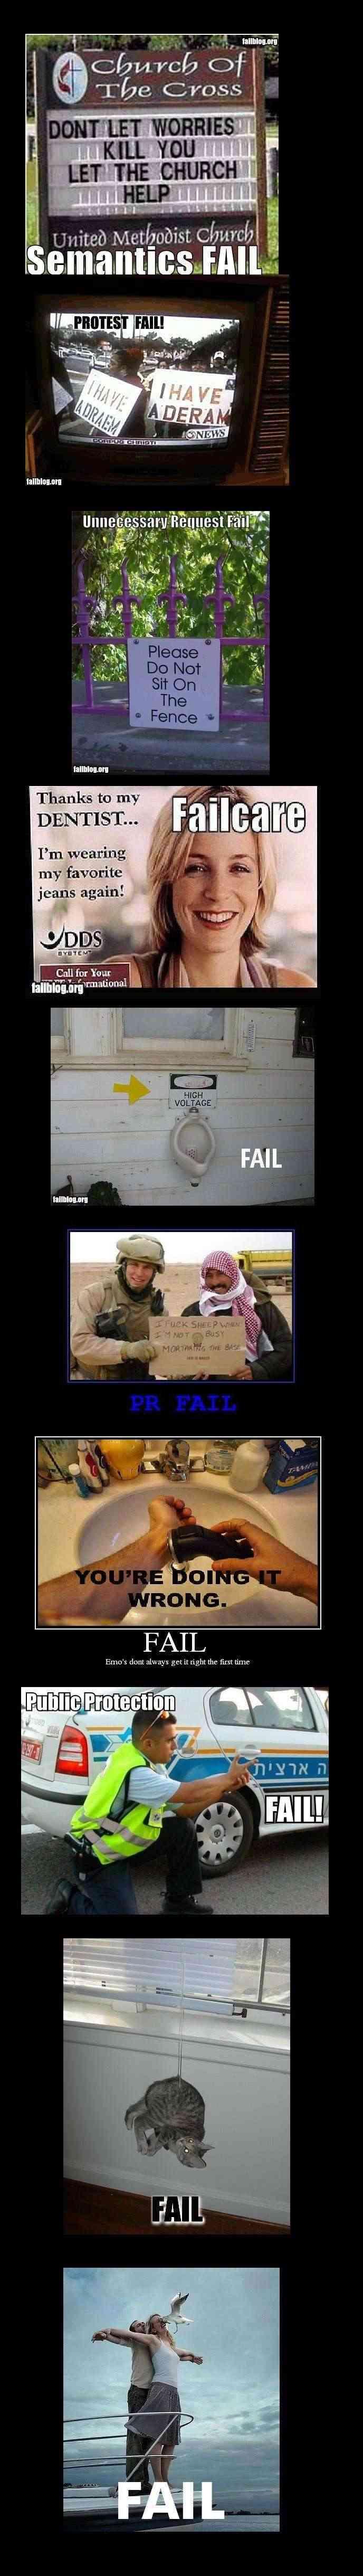 HAHAHA Funny Pic Thread Fail_c10